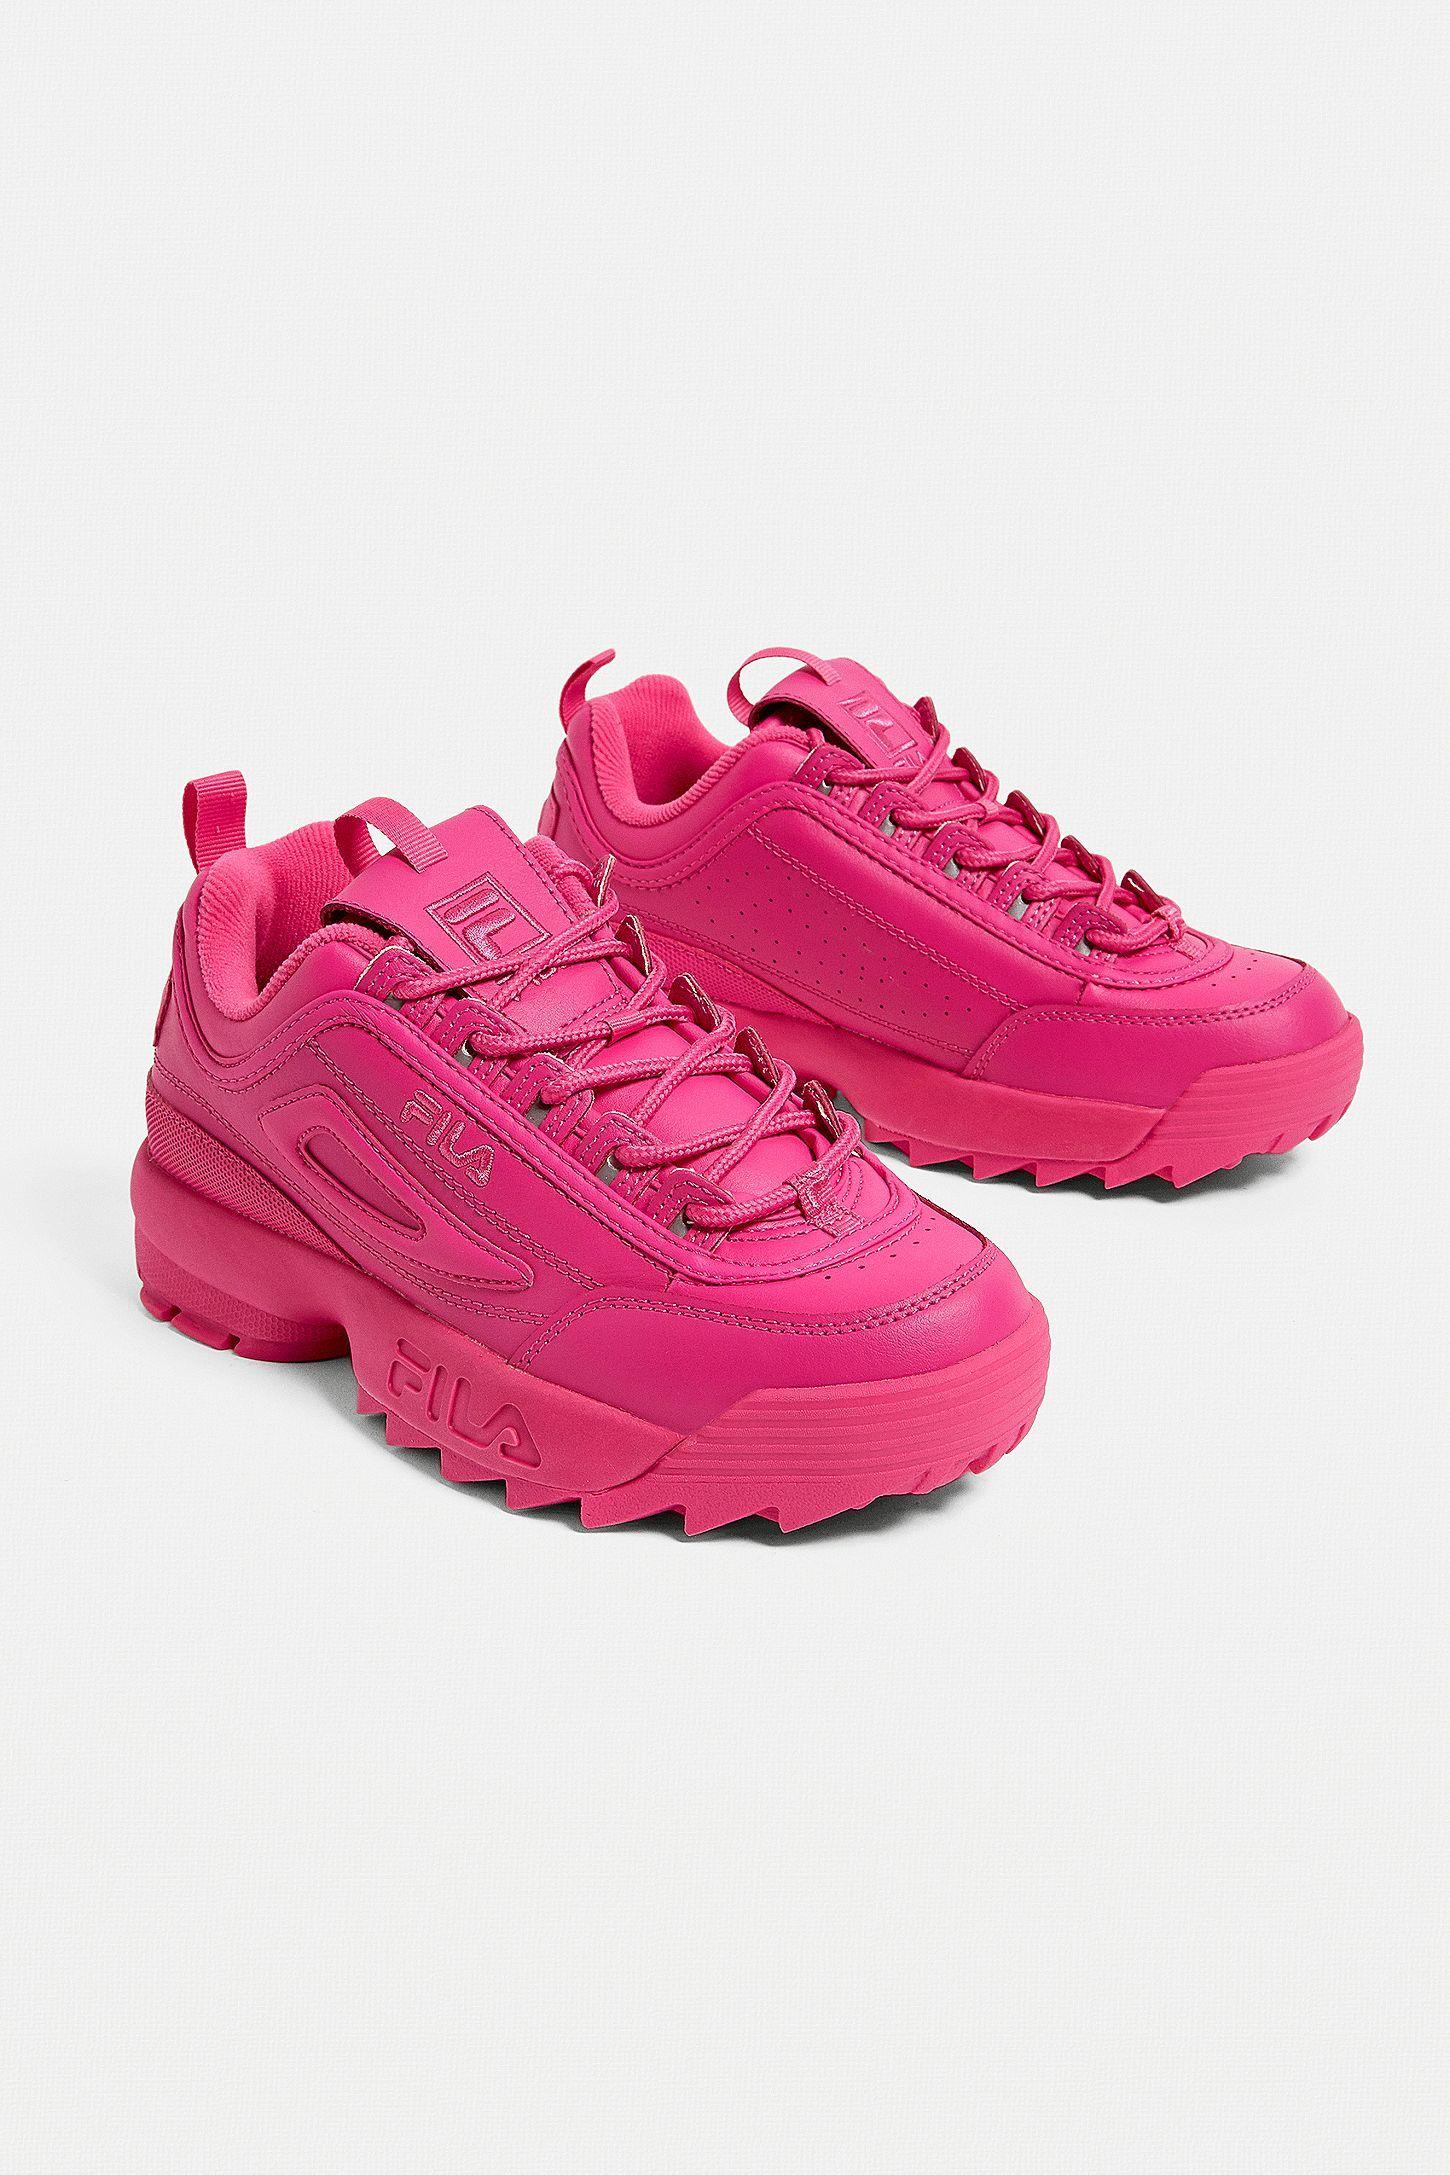 FILA Disruptor Premium Pink Trainers